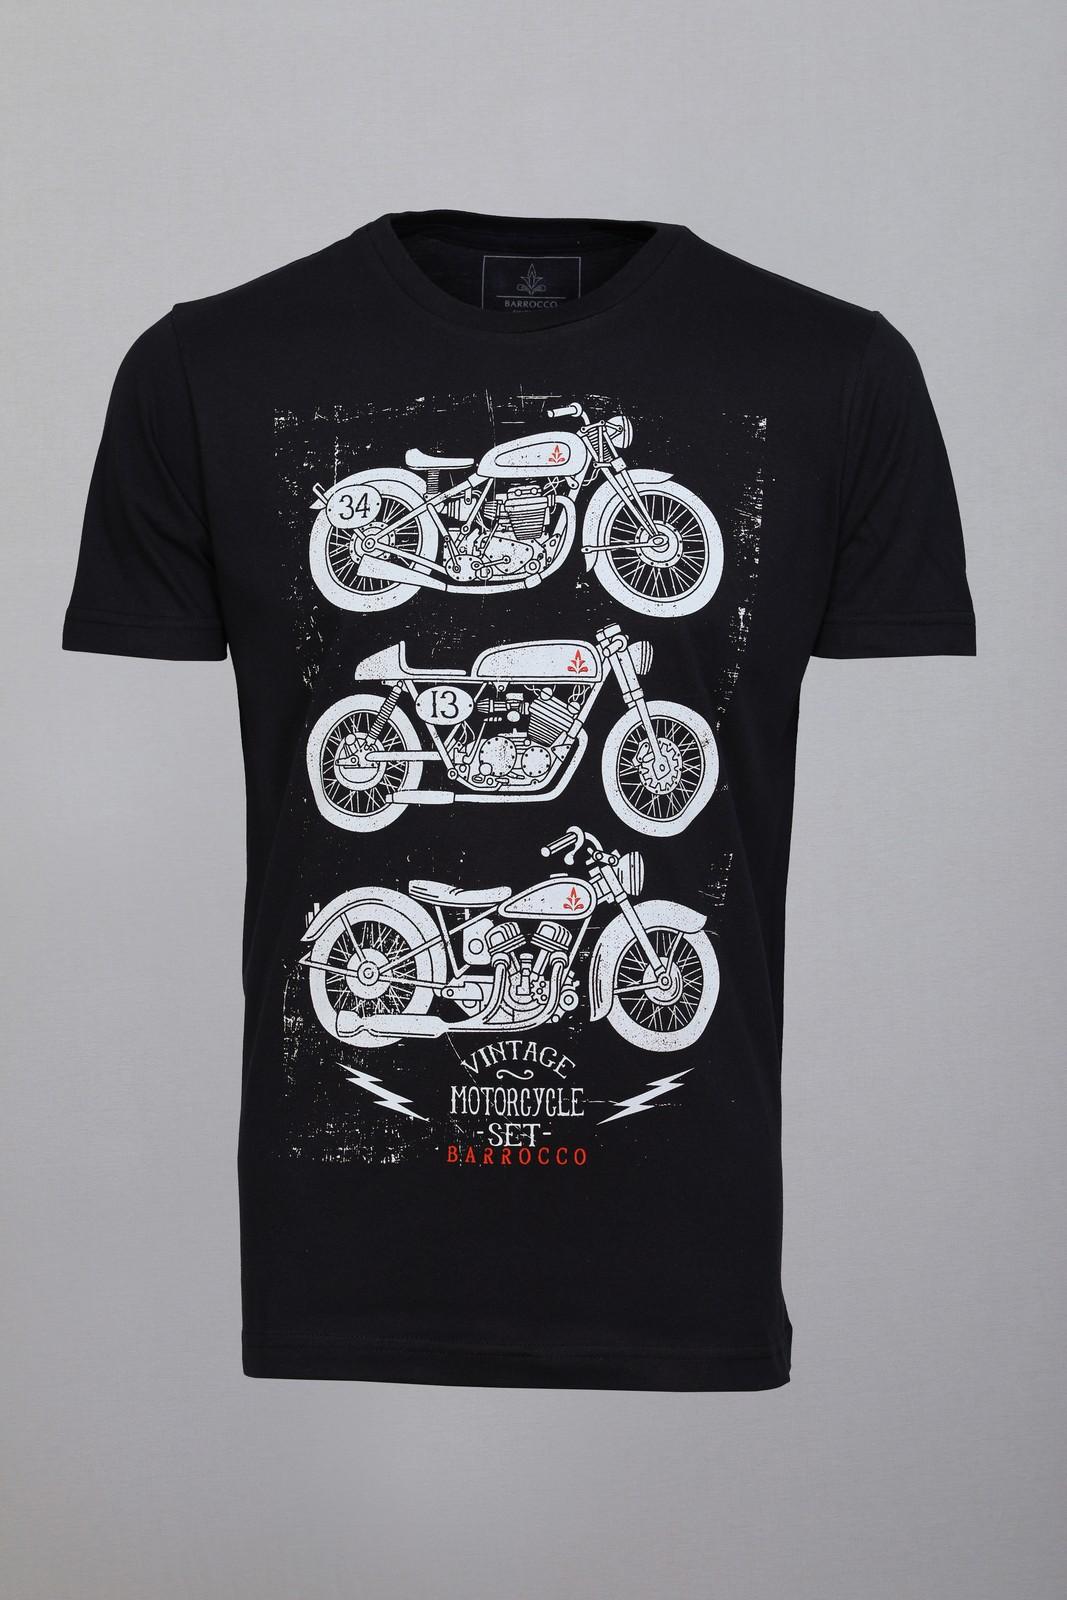 Kit Camisetas Barrocco Motos - 3 Camisetas Cor Preta/ Tamanho P